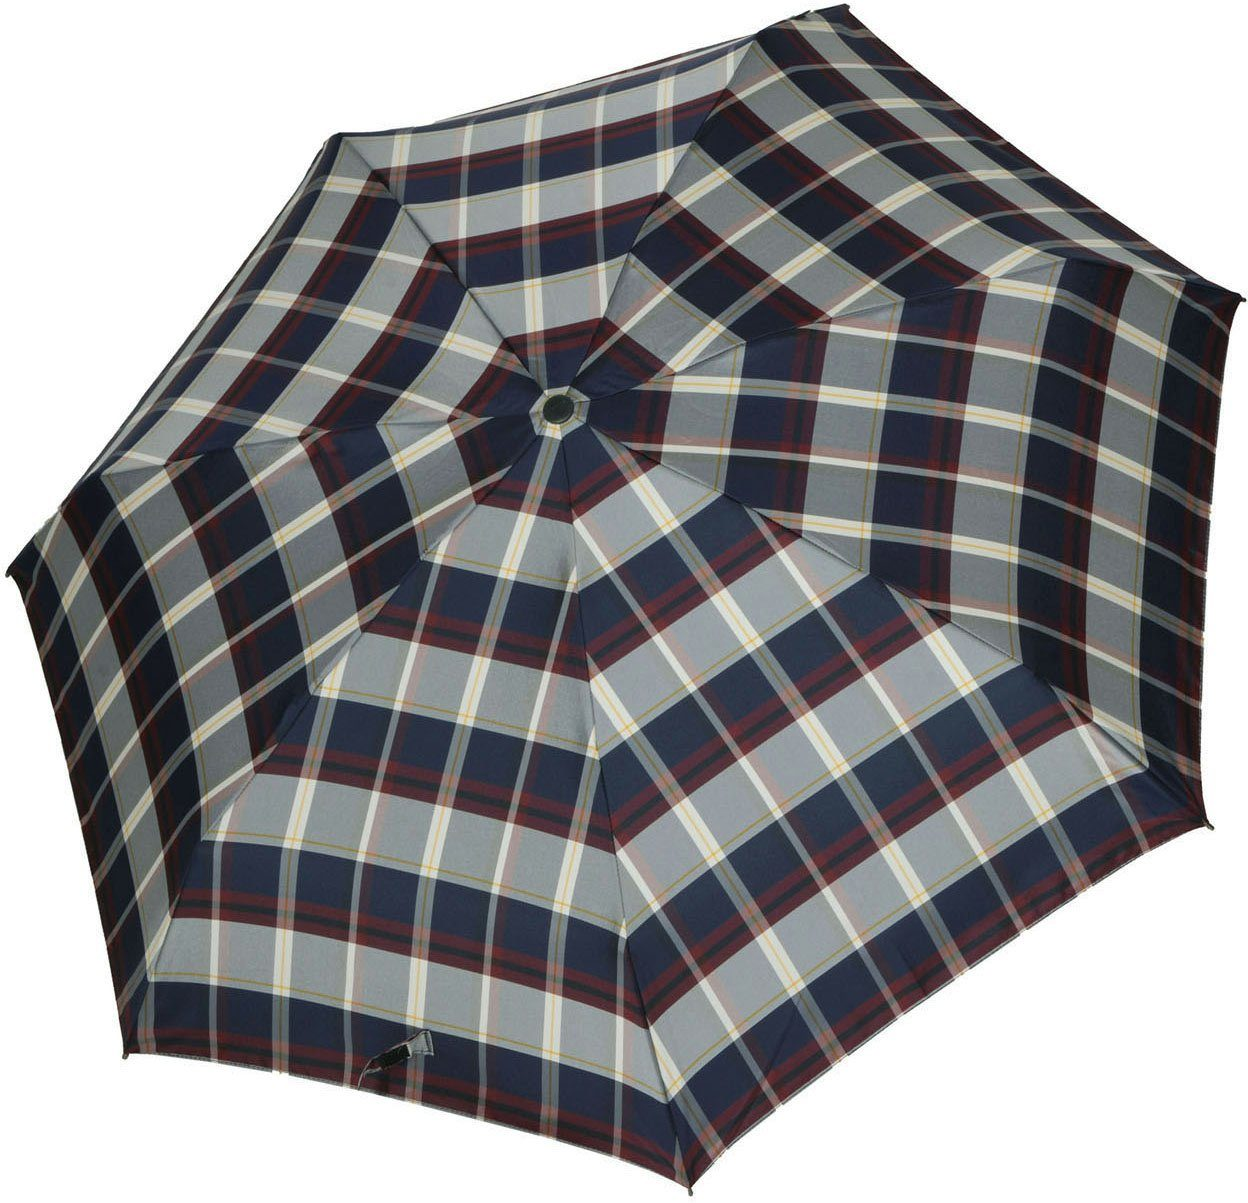 Knirps® Regenschirm, »Taschenschirm Piccolo check navy + bordeaux«